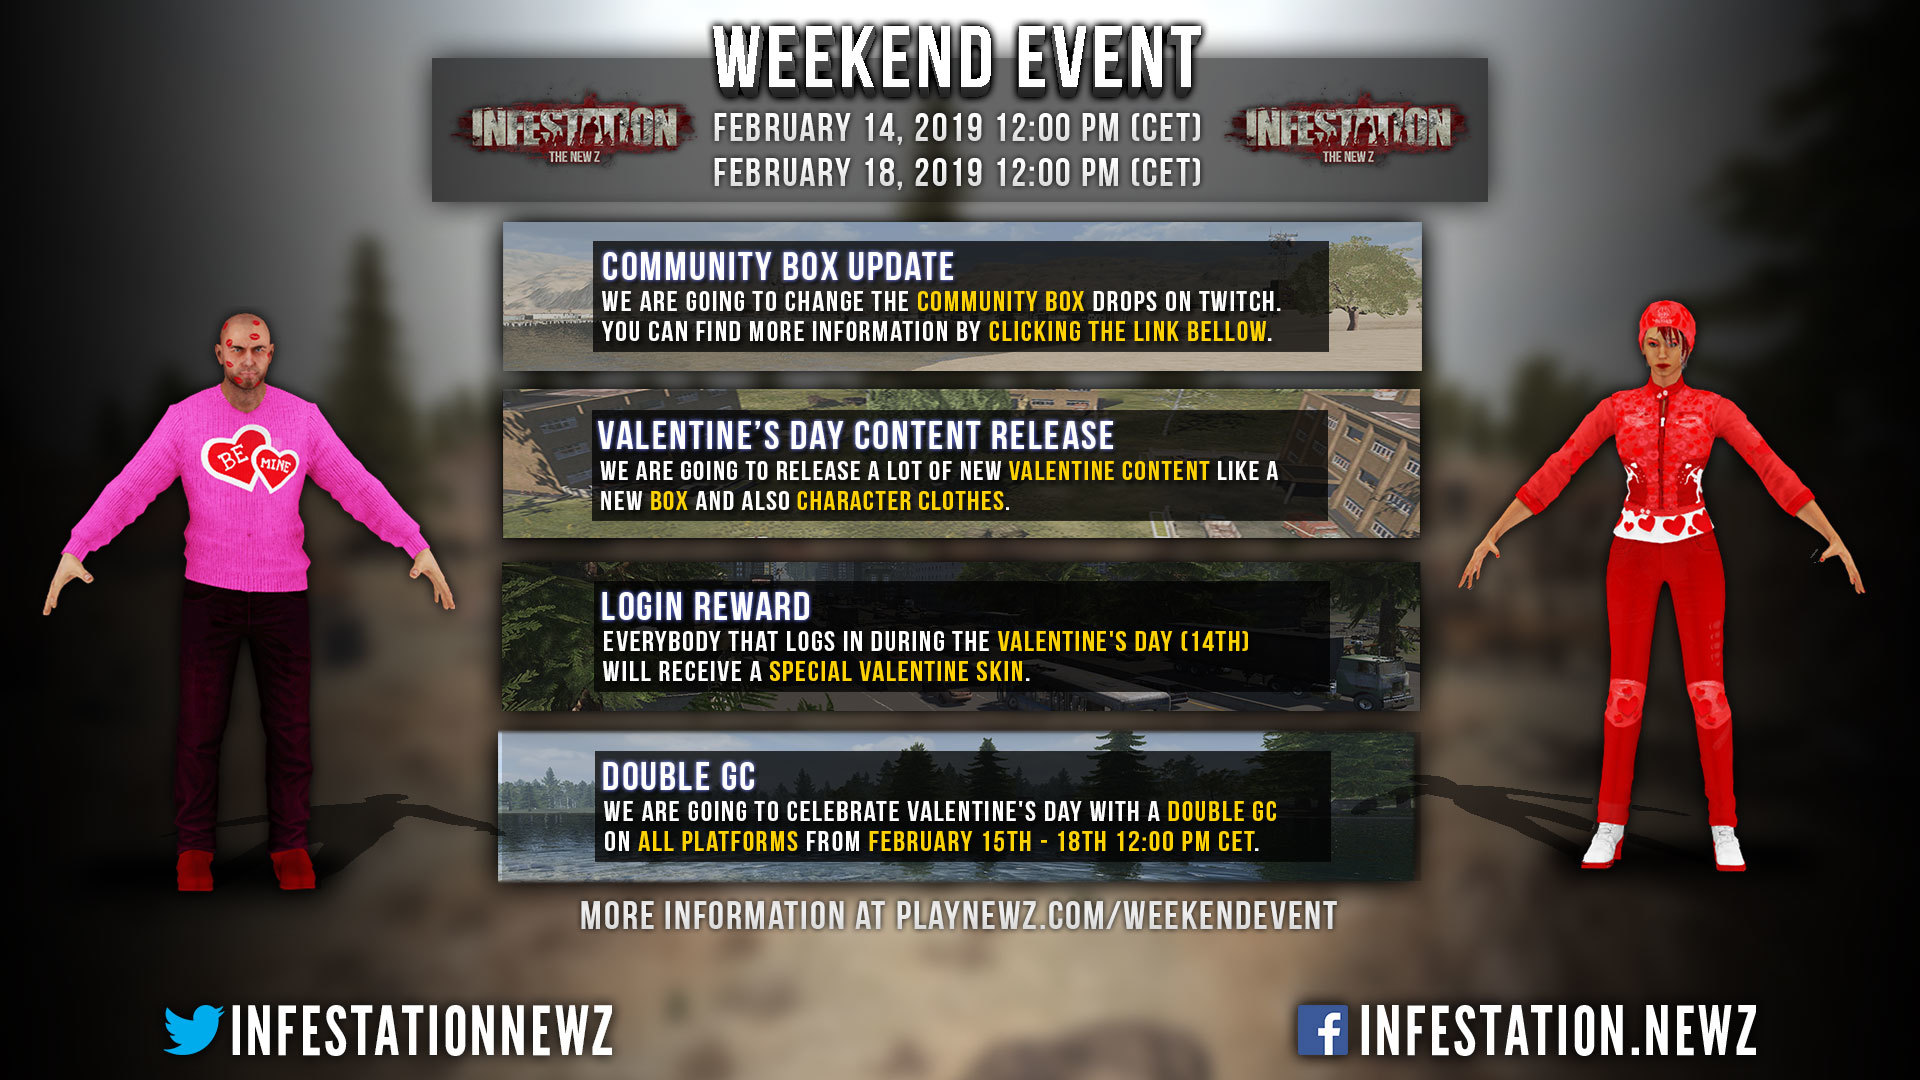 Steam Infestation The New Z Valentine S Day Event